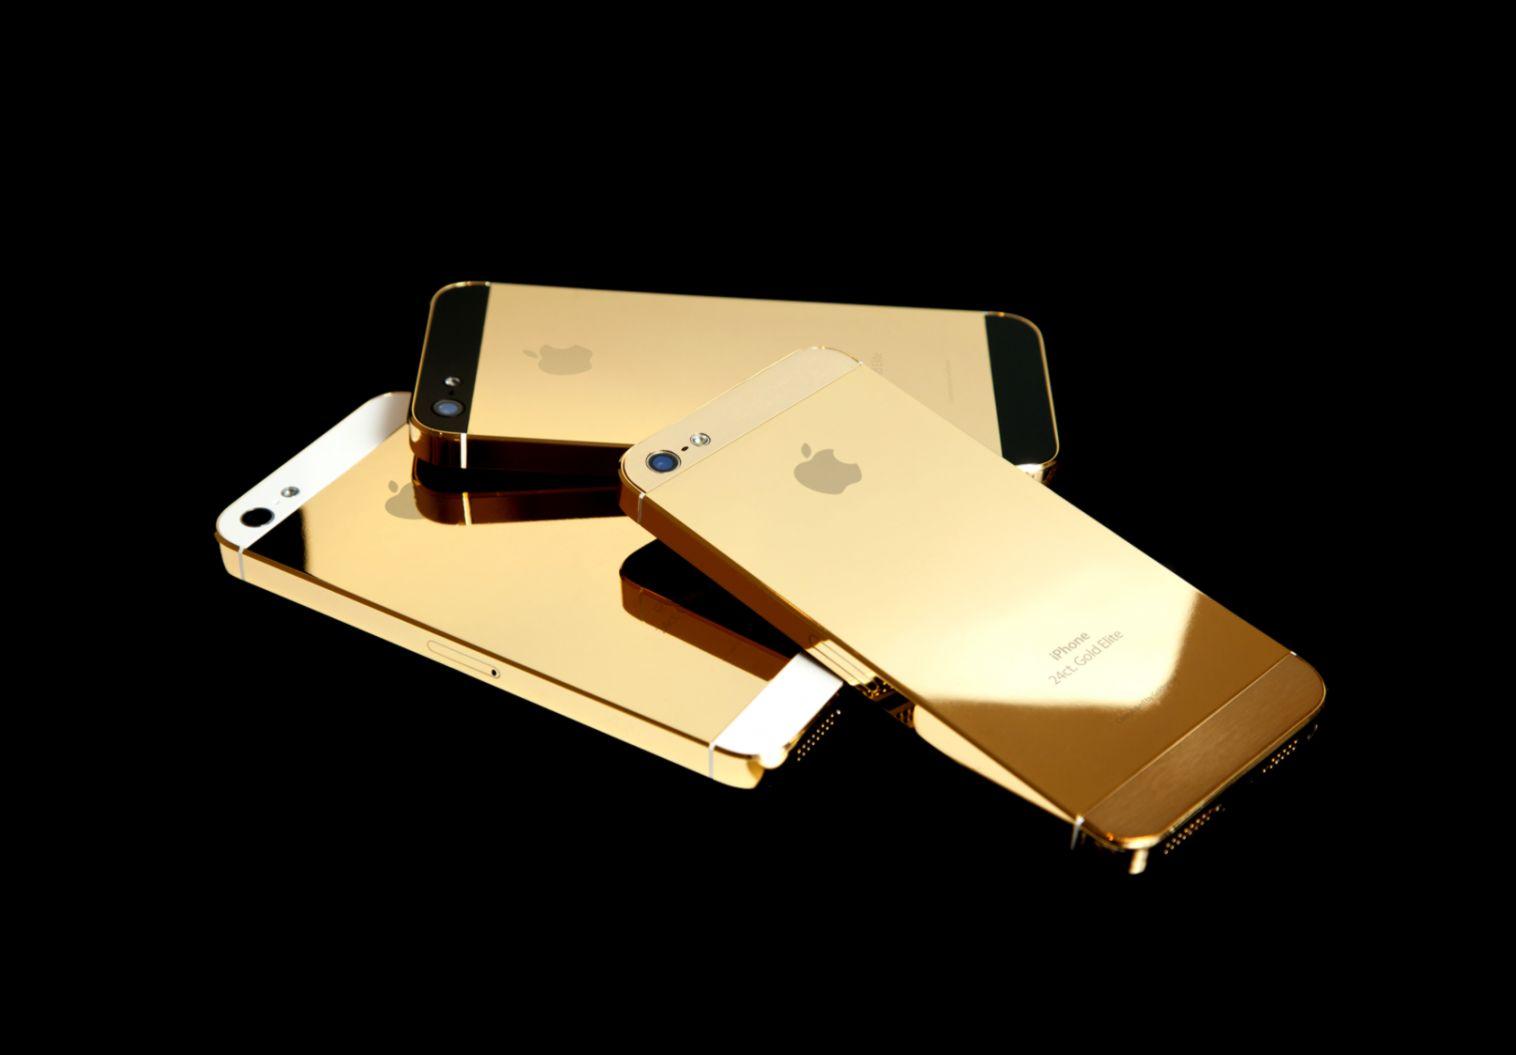 Black And Gold Wallpaper Iphone 19 Desktop Wallpaper - Iphone Gold Apple - HD Wallpaper